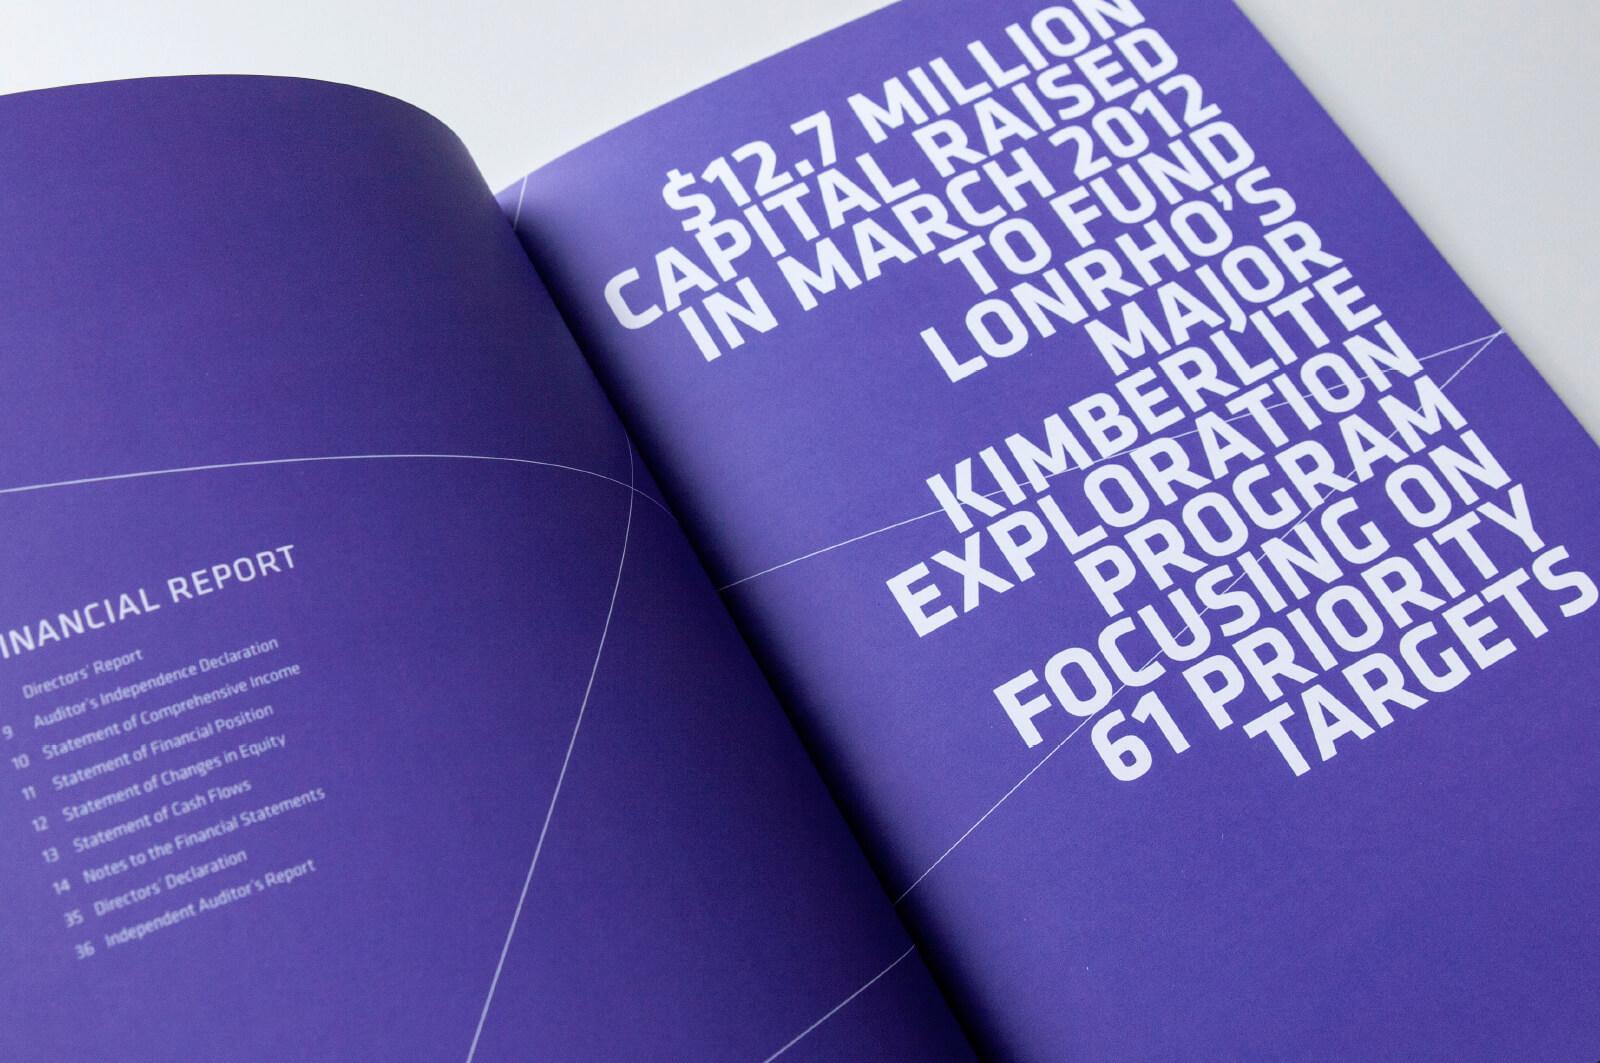 Lonrho-annual-report-2012-5